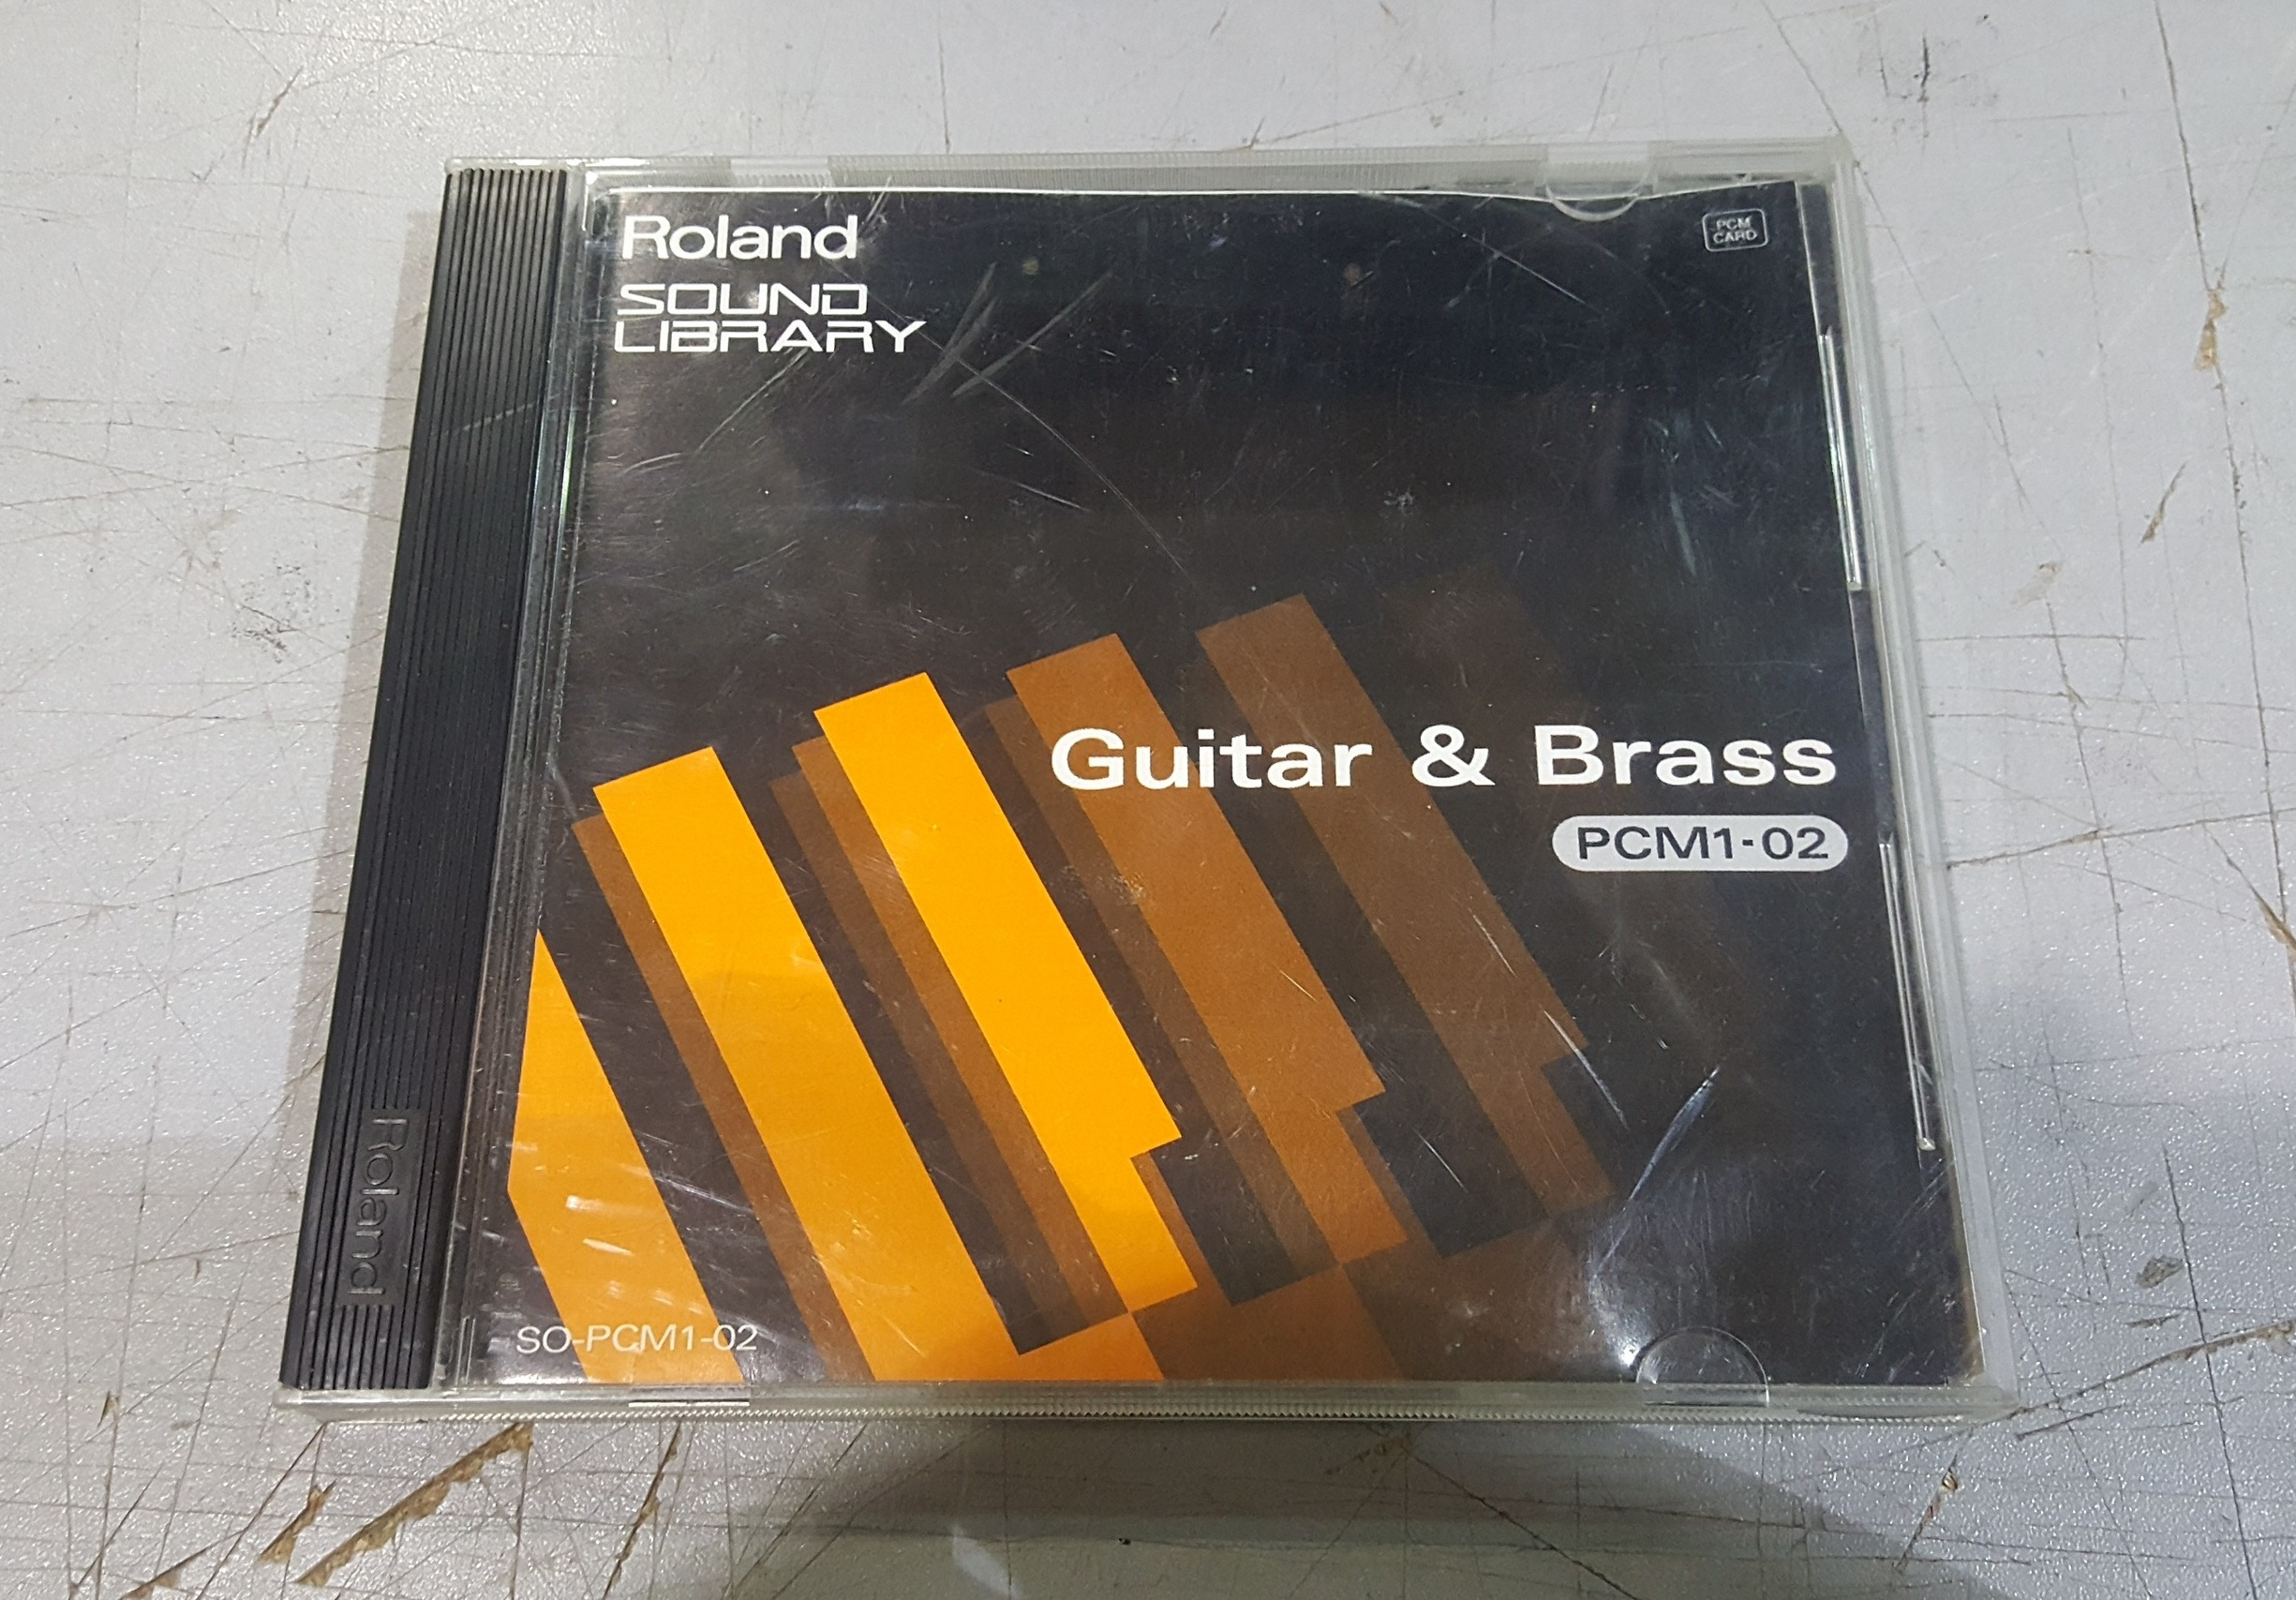 ROLAND SOUND LIBRARY JV-80